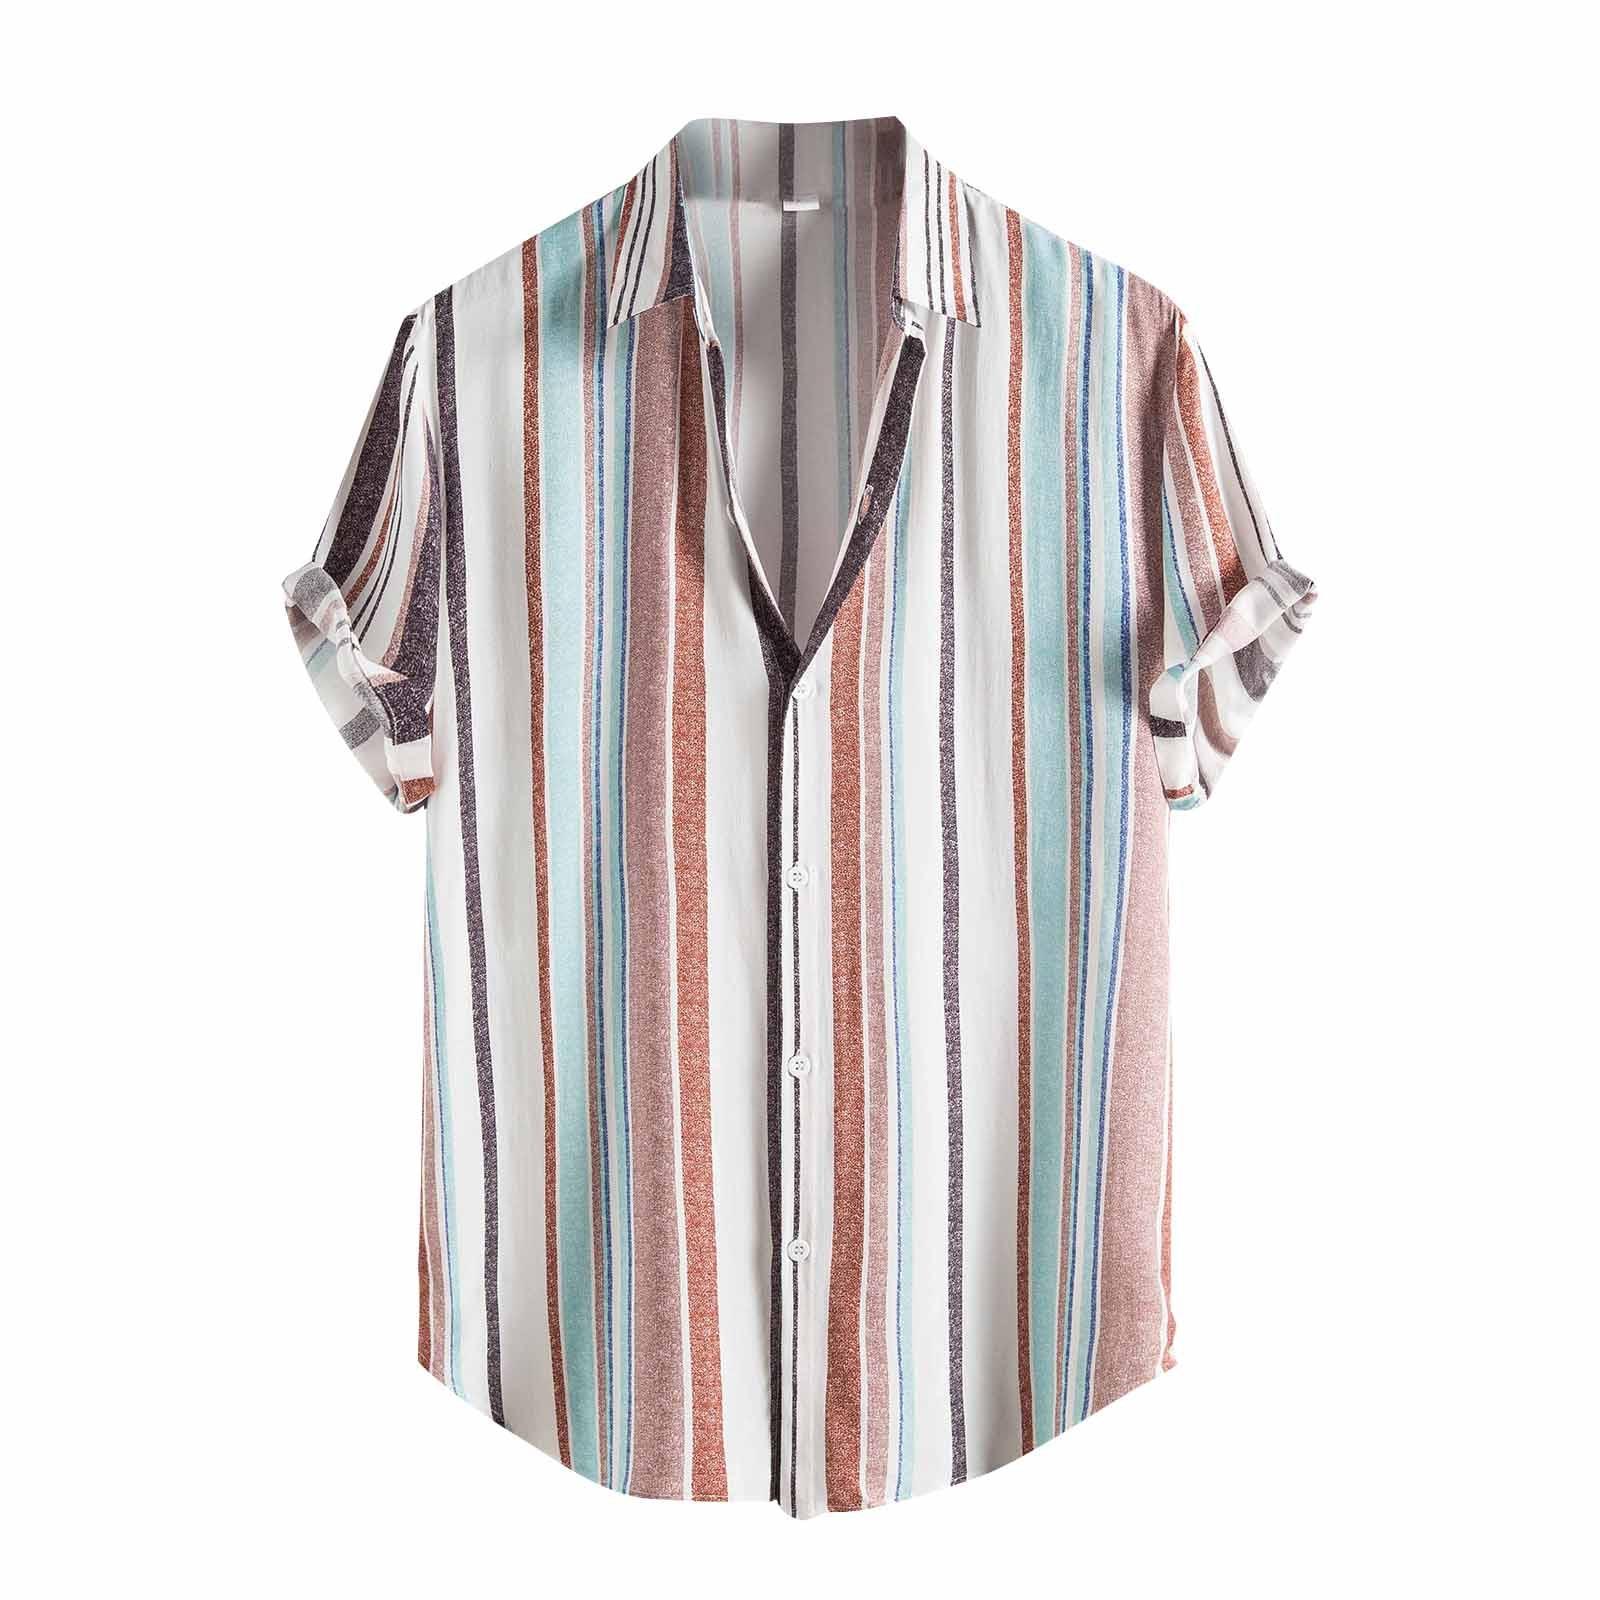 2021 Summer Fashion Men Shirts Casual Short Sleeve Stripe Shirt High Quality Men Clothing Tops Vestidos Dress Shirts Camisas